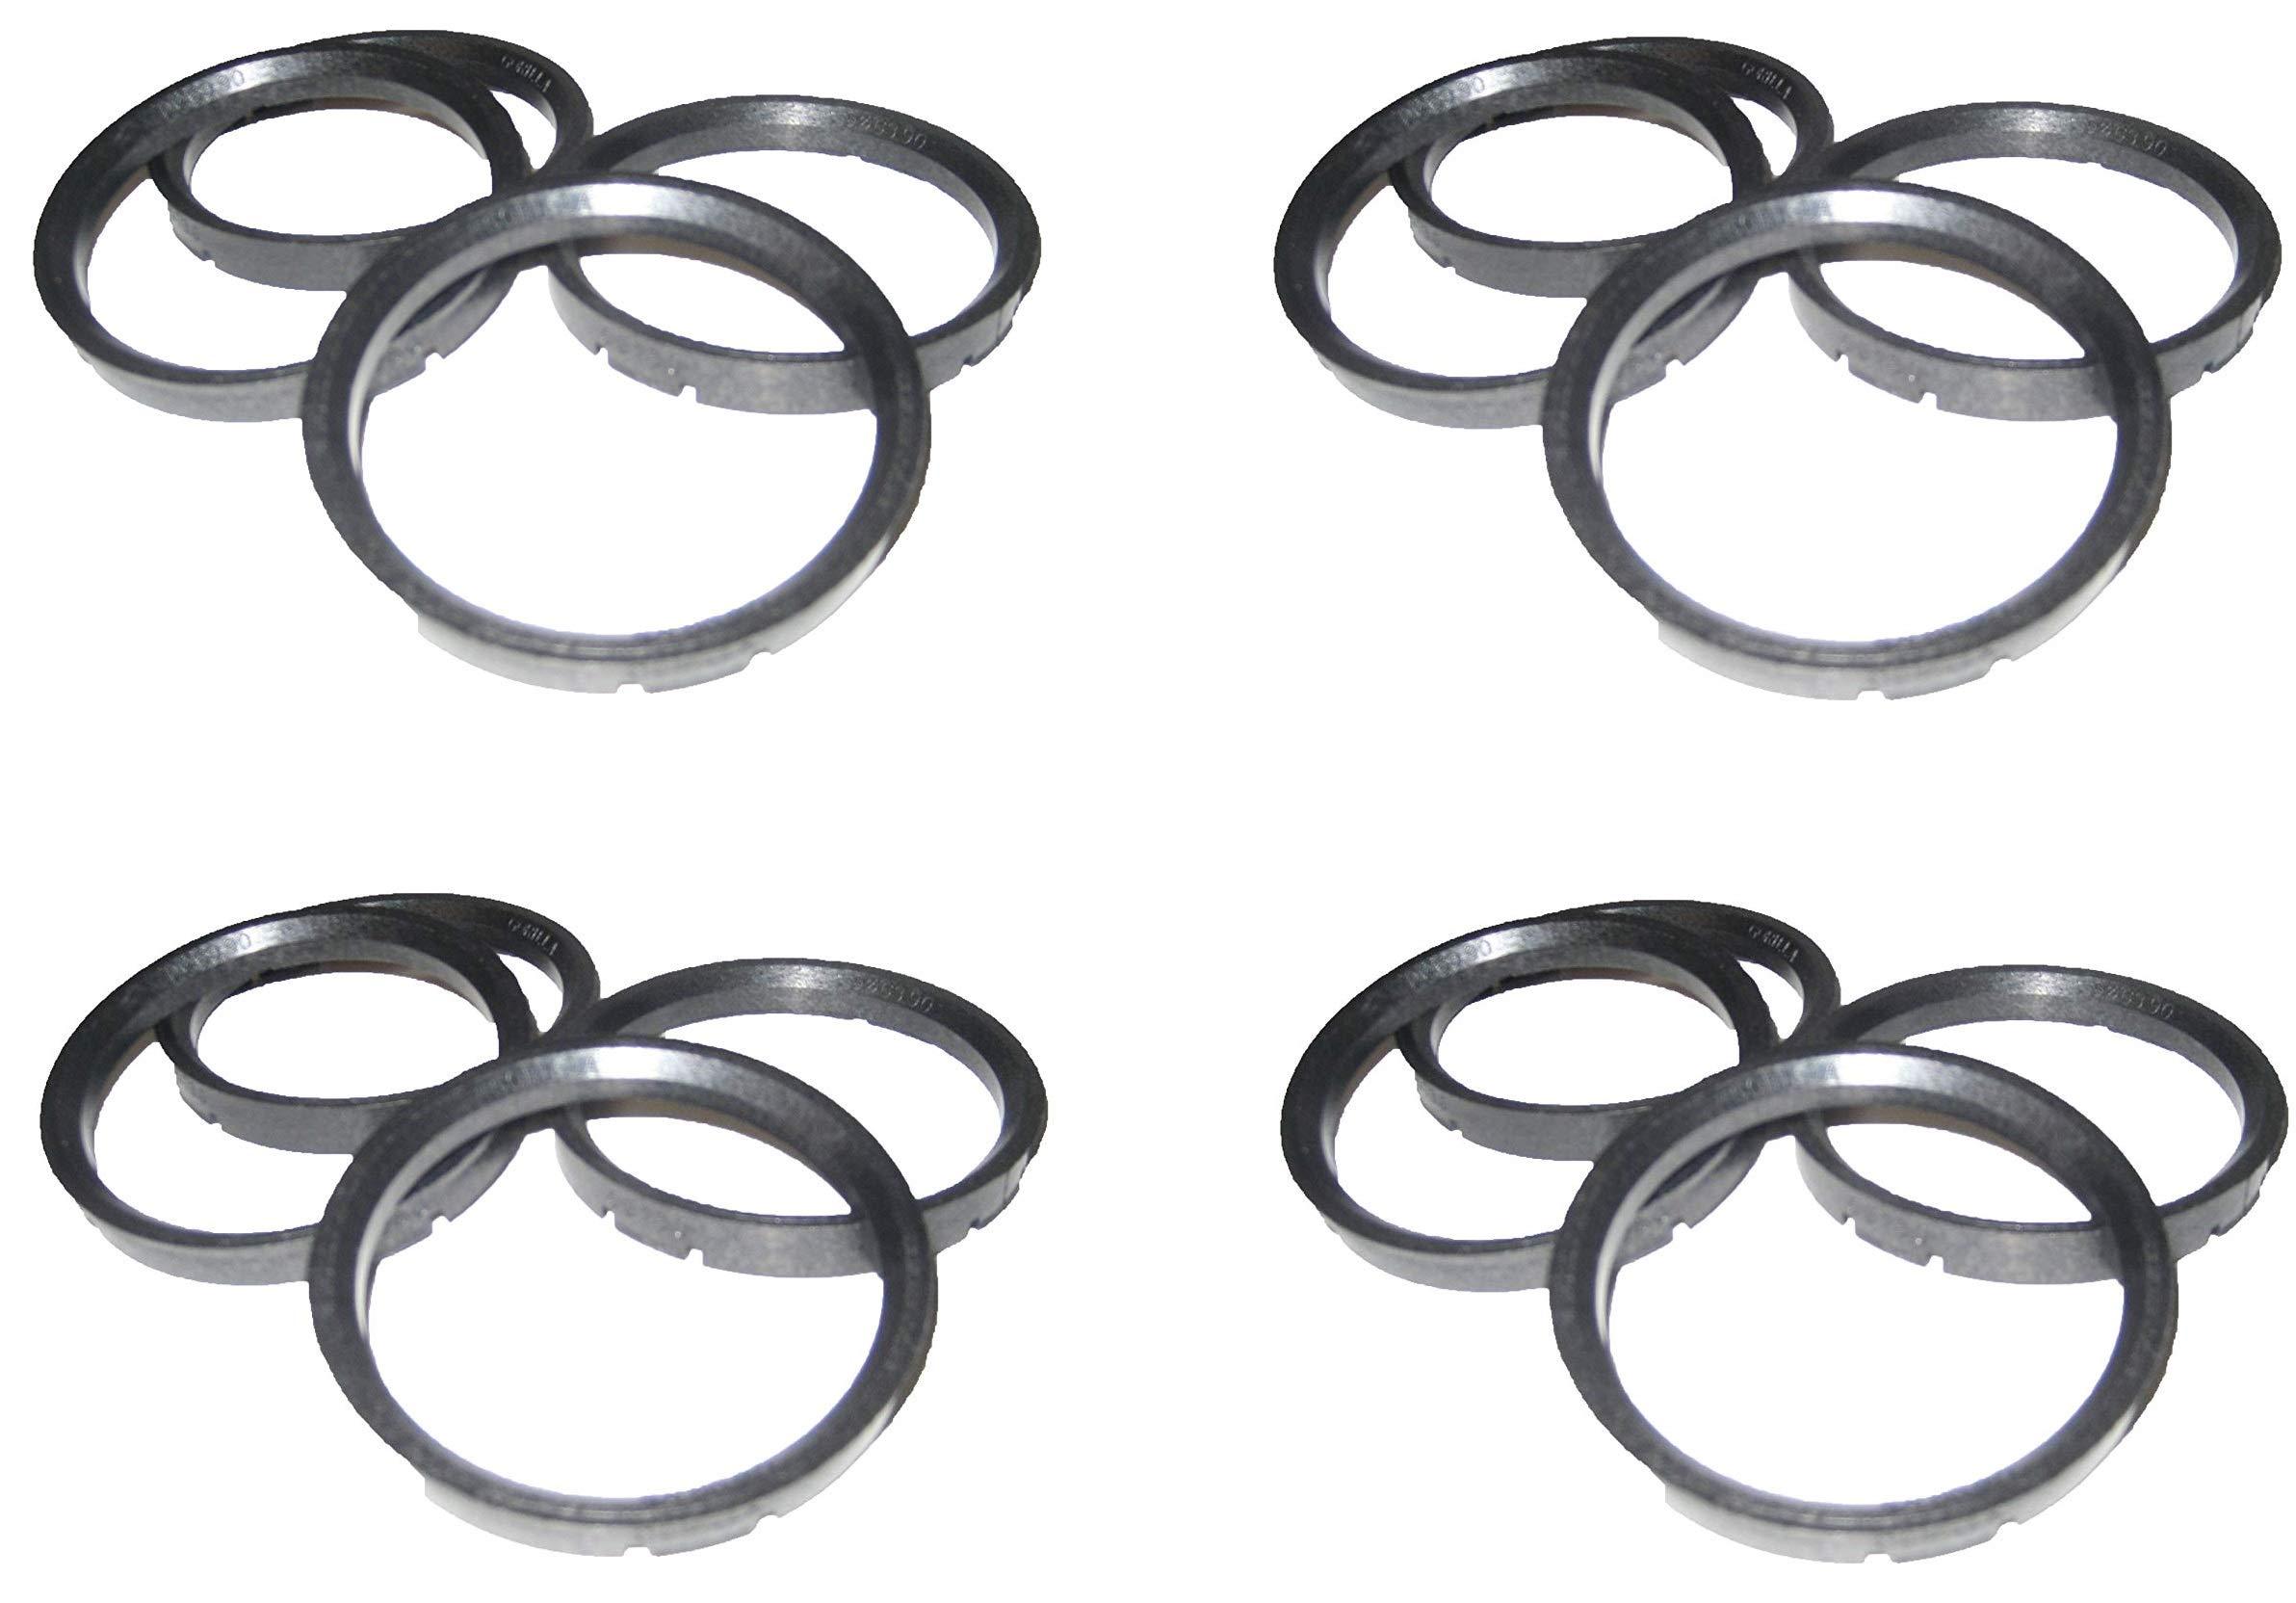 Gorilla Automotive 108-7810 Wheel Hub Centric Rings (108mm OD x 78.10mm ID) (4)